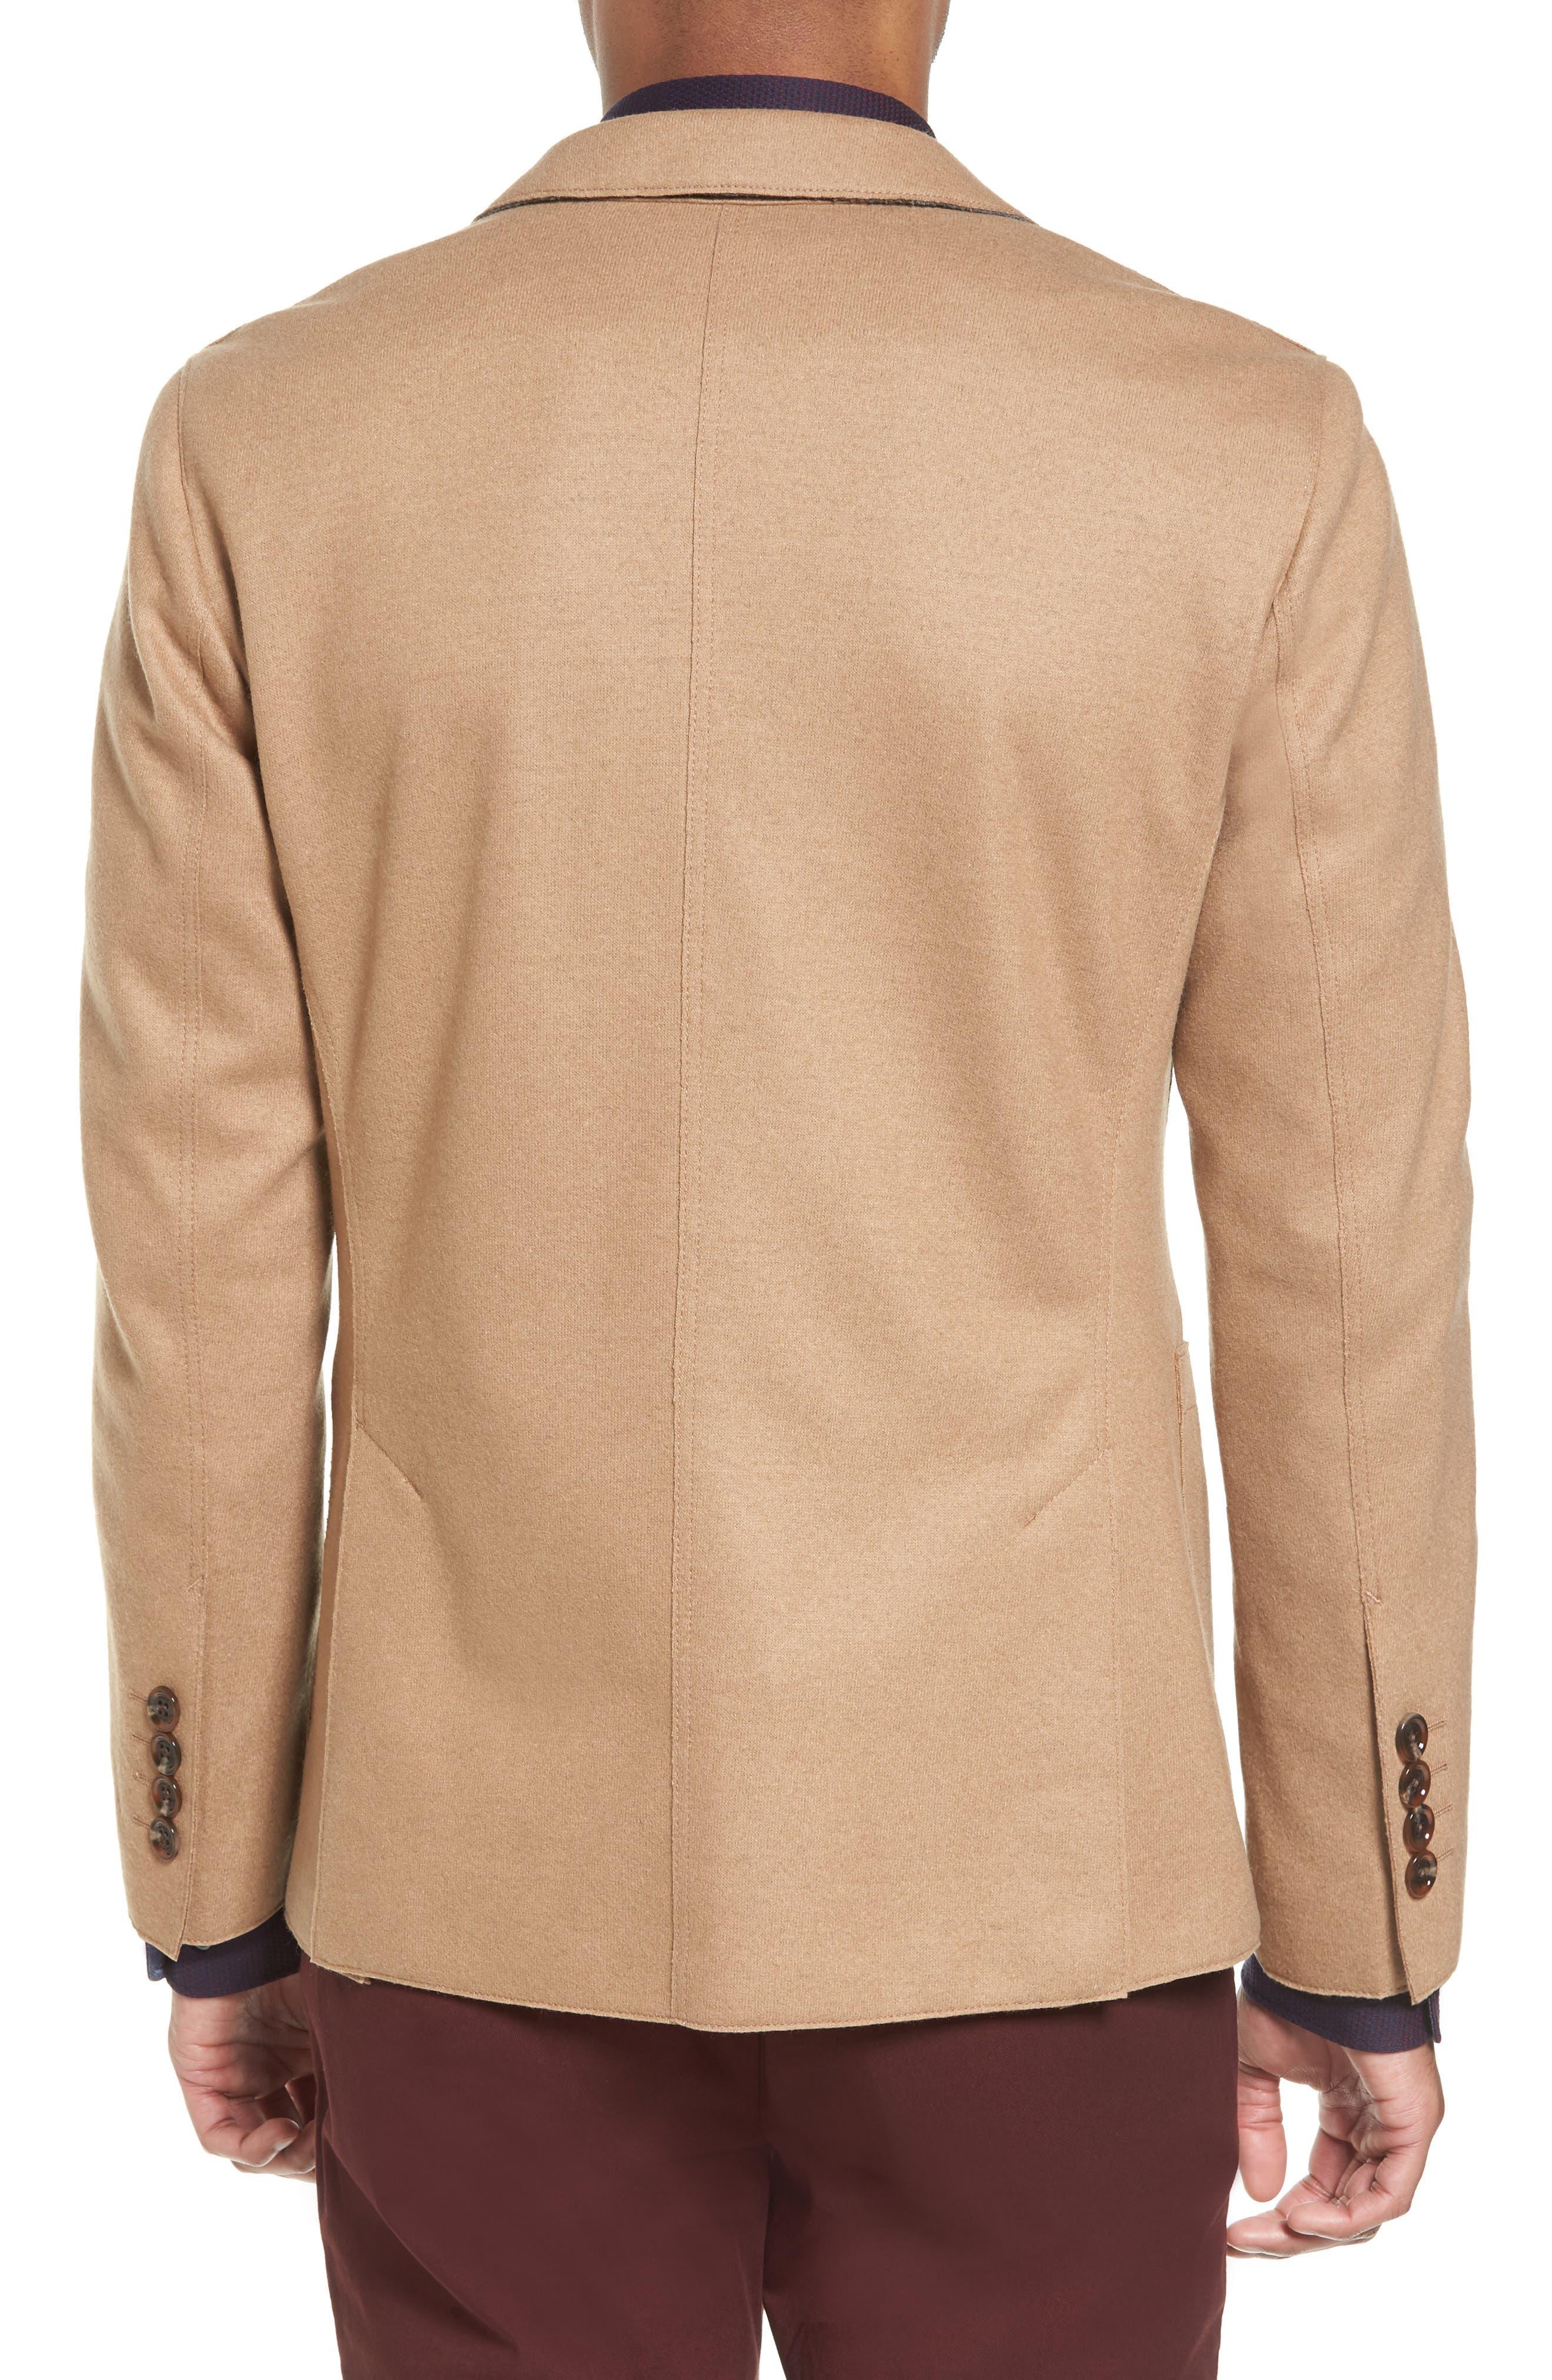 Nordin Trim Fit Virgin Wool Sport Coat,                             Alternate thumbnail 2, color,                             262